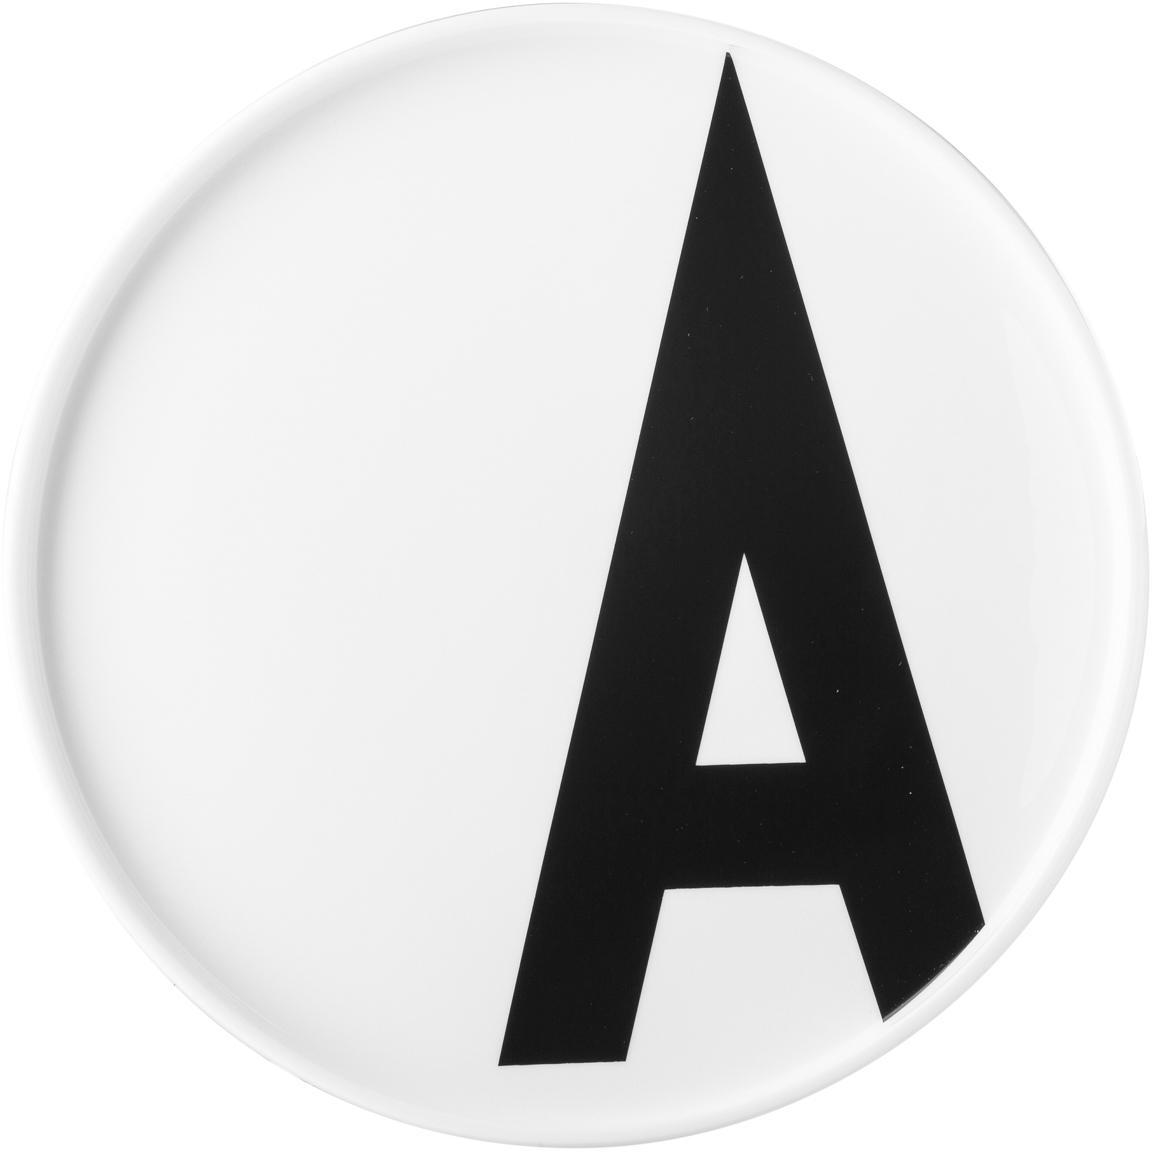 Design ontbijtbord Personal met letters (varianten van A tot Z), Fine Bone China, porselein, Wit, zwart, Ø 22 x H 2 cm